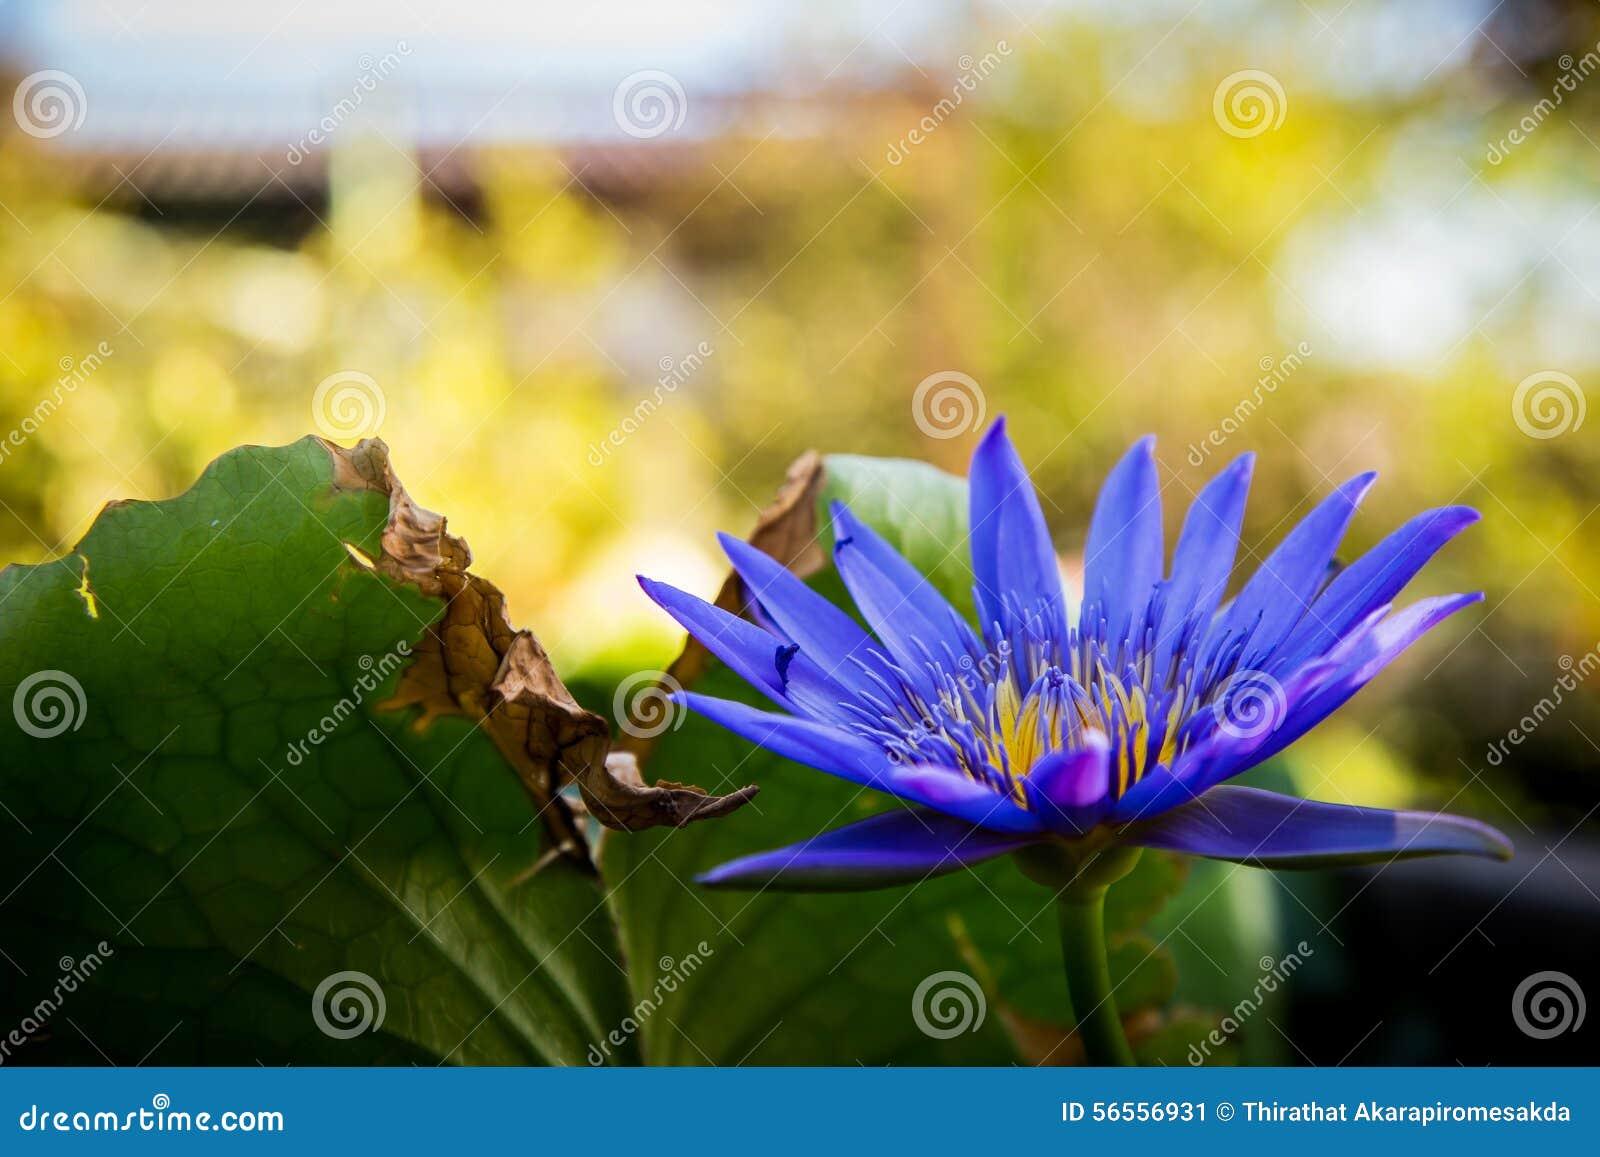 Download Κρίνος νερού το μπλε Lotus στοκ εικόνα. εικόνα από εποχή - 56556931